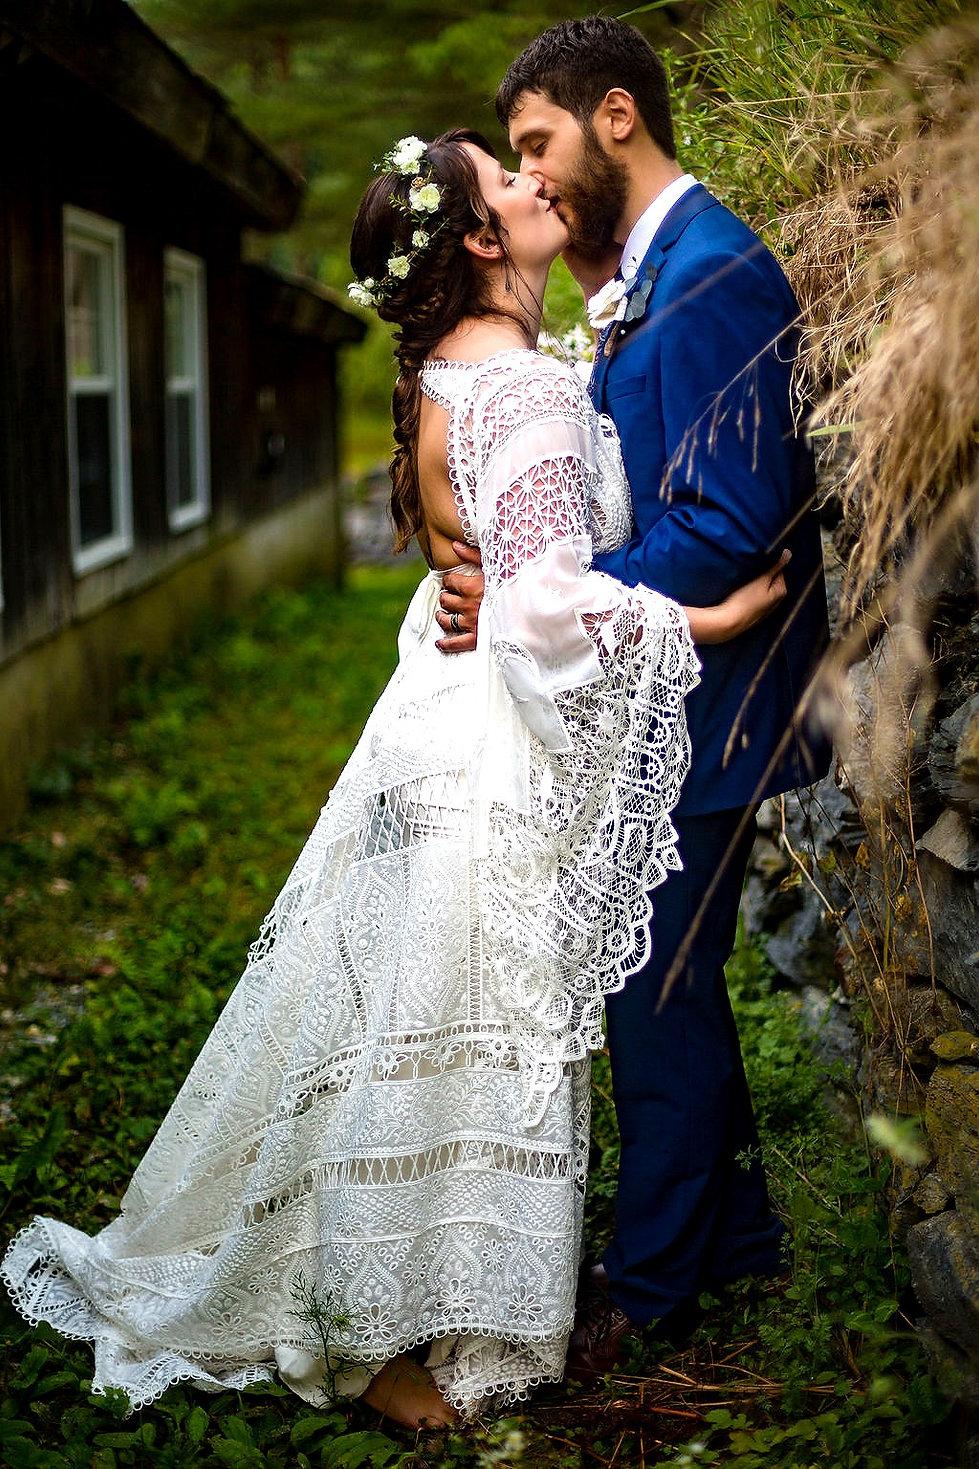 Boho Bride and Groom Kissing